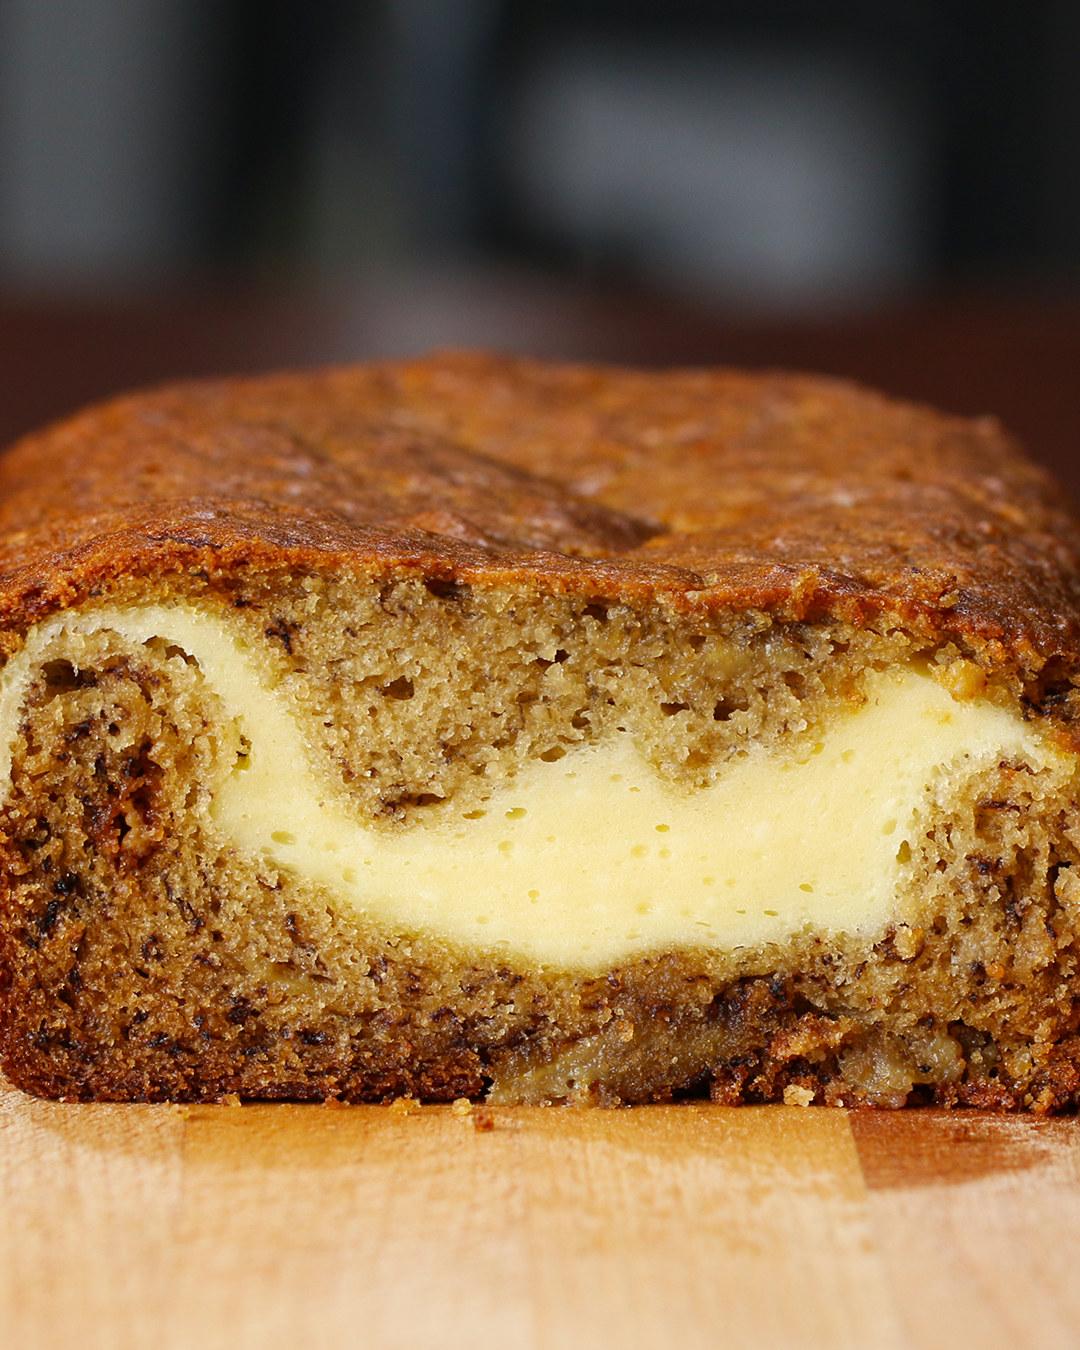 Cheesecake-Filled Banana Bread